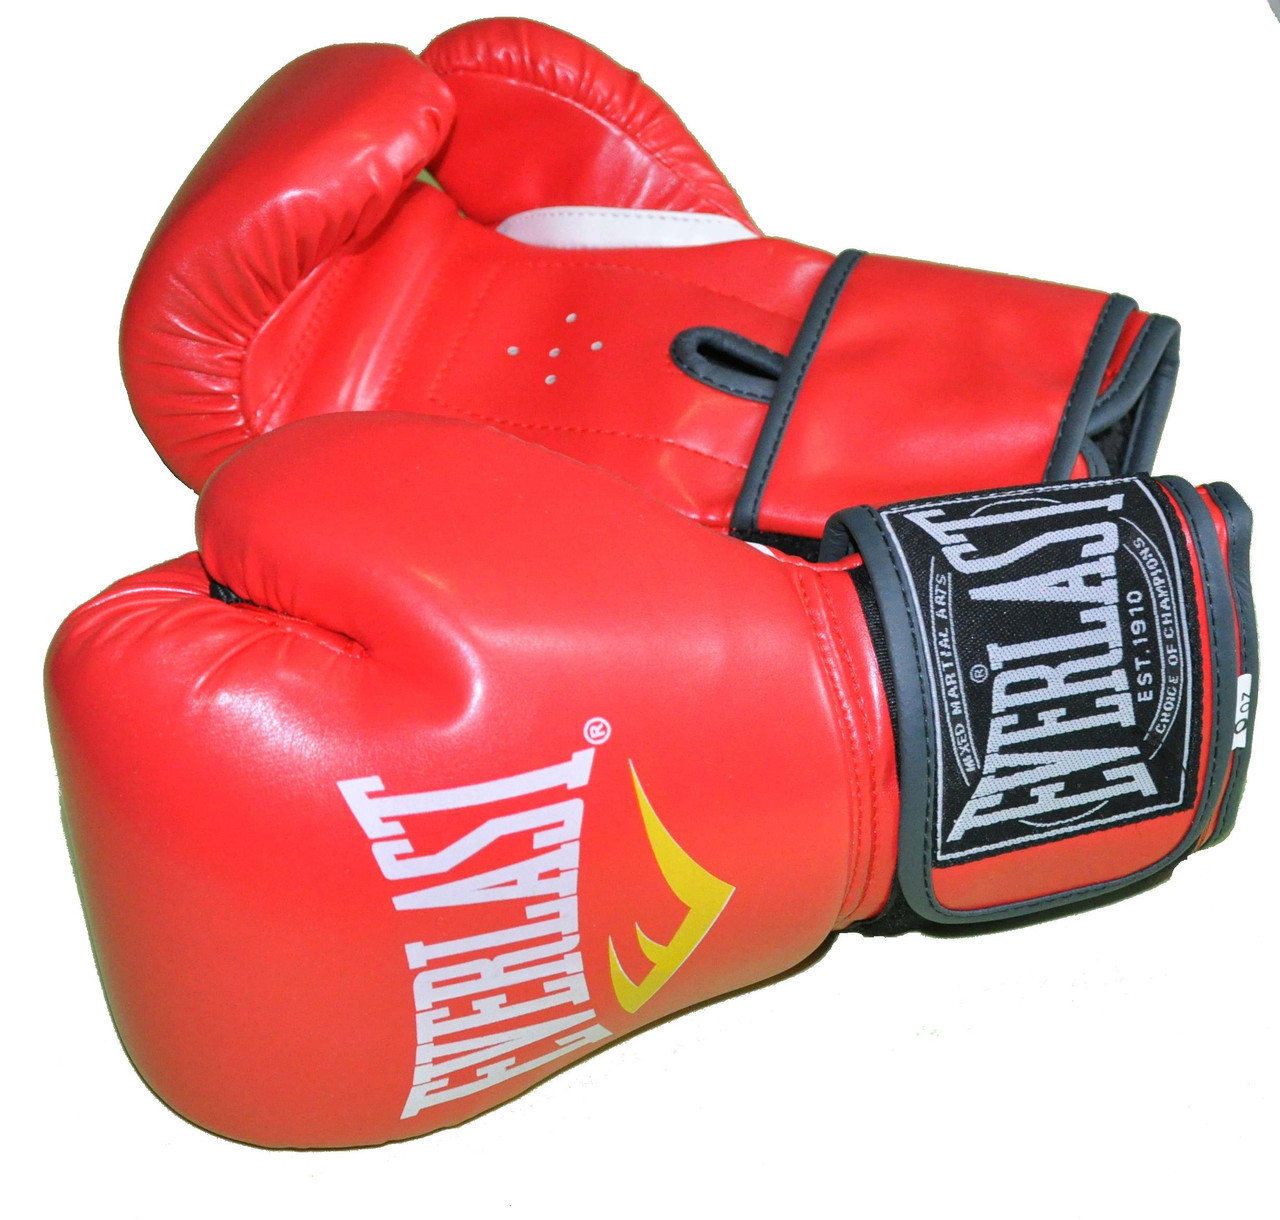 Боксерские перчатки в стиле EVERLAST BO-3987-10RD   размер 10 унц.